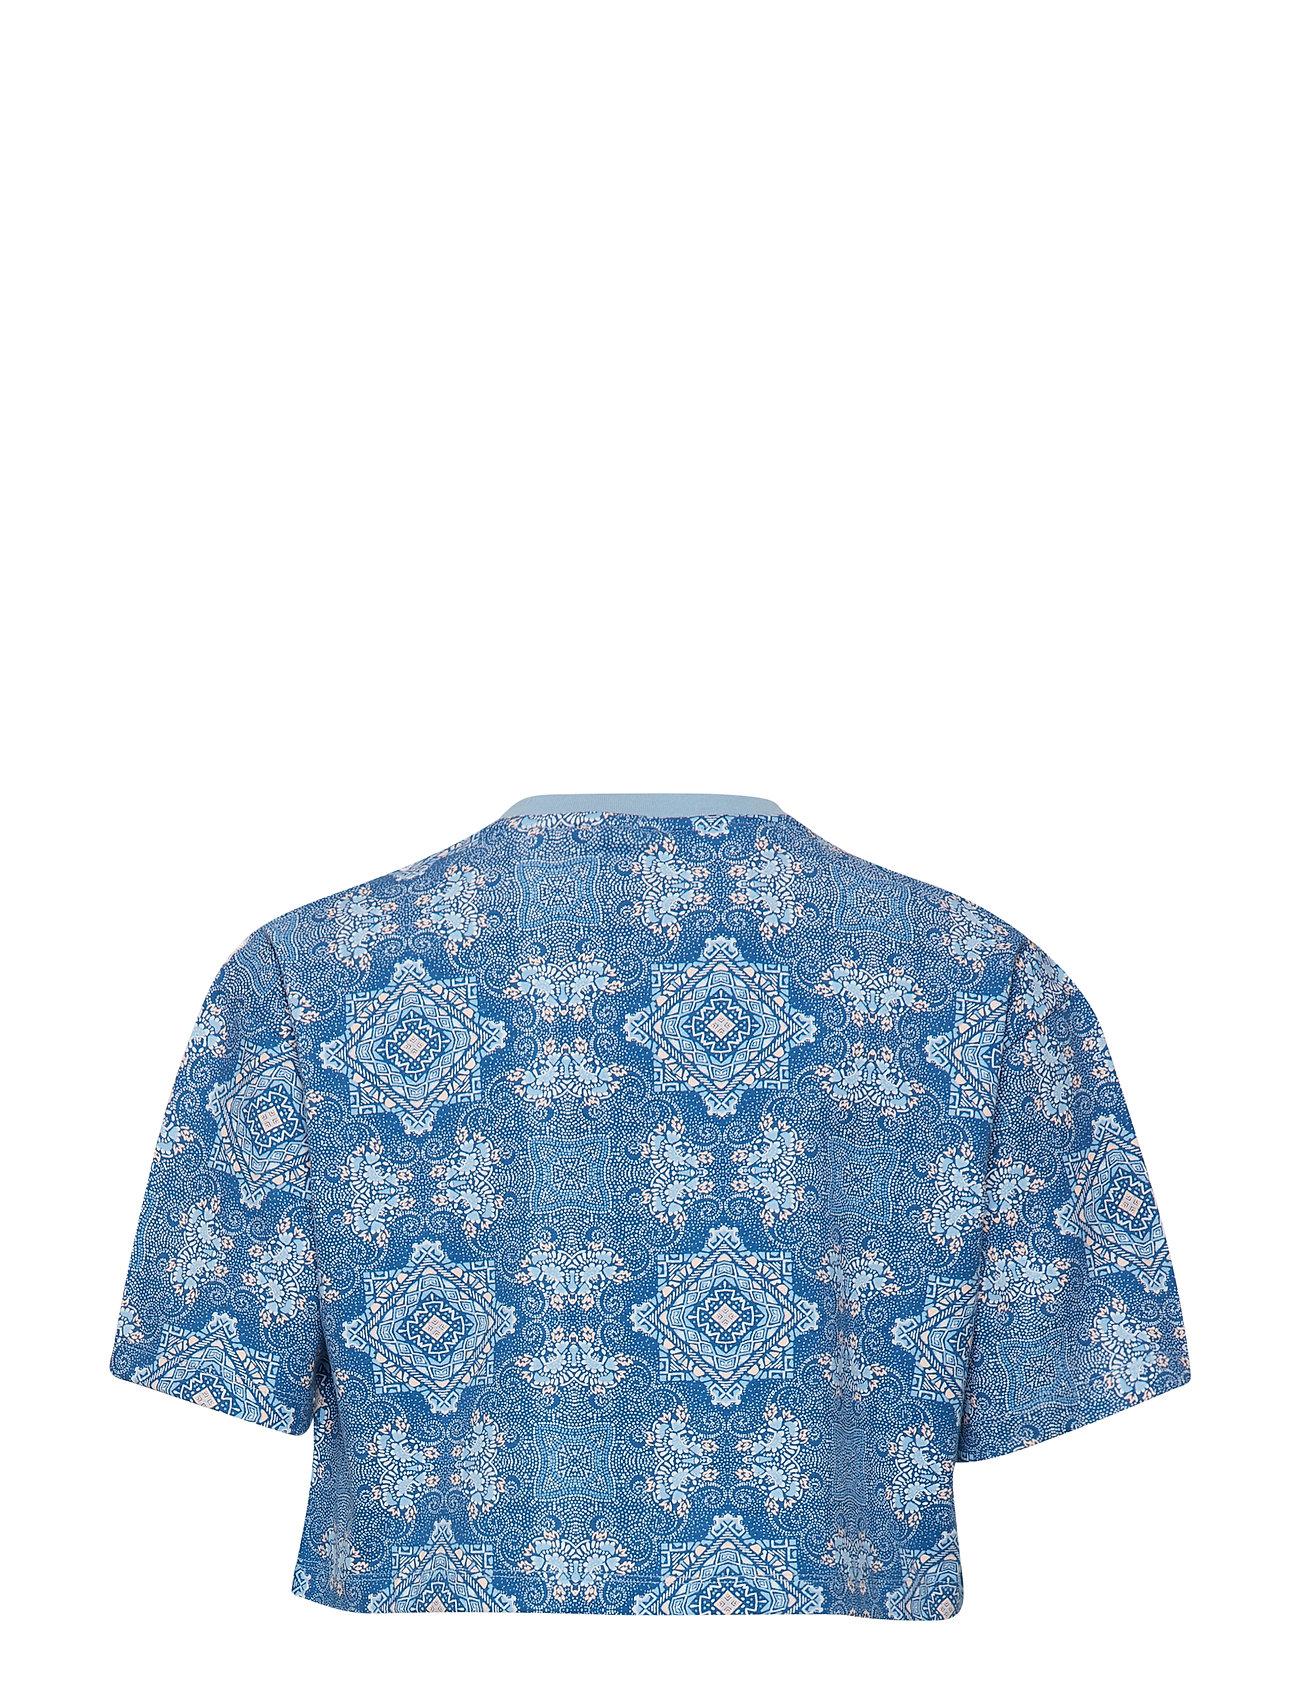 Cc 3stripes Tee T shirt Blå ADIDAS ORIGINALS